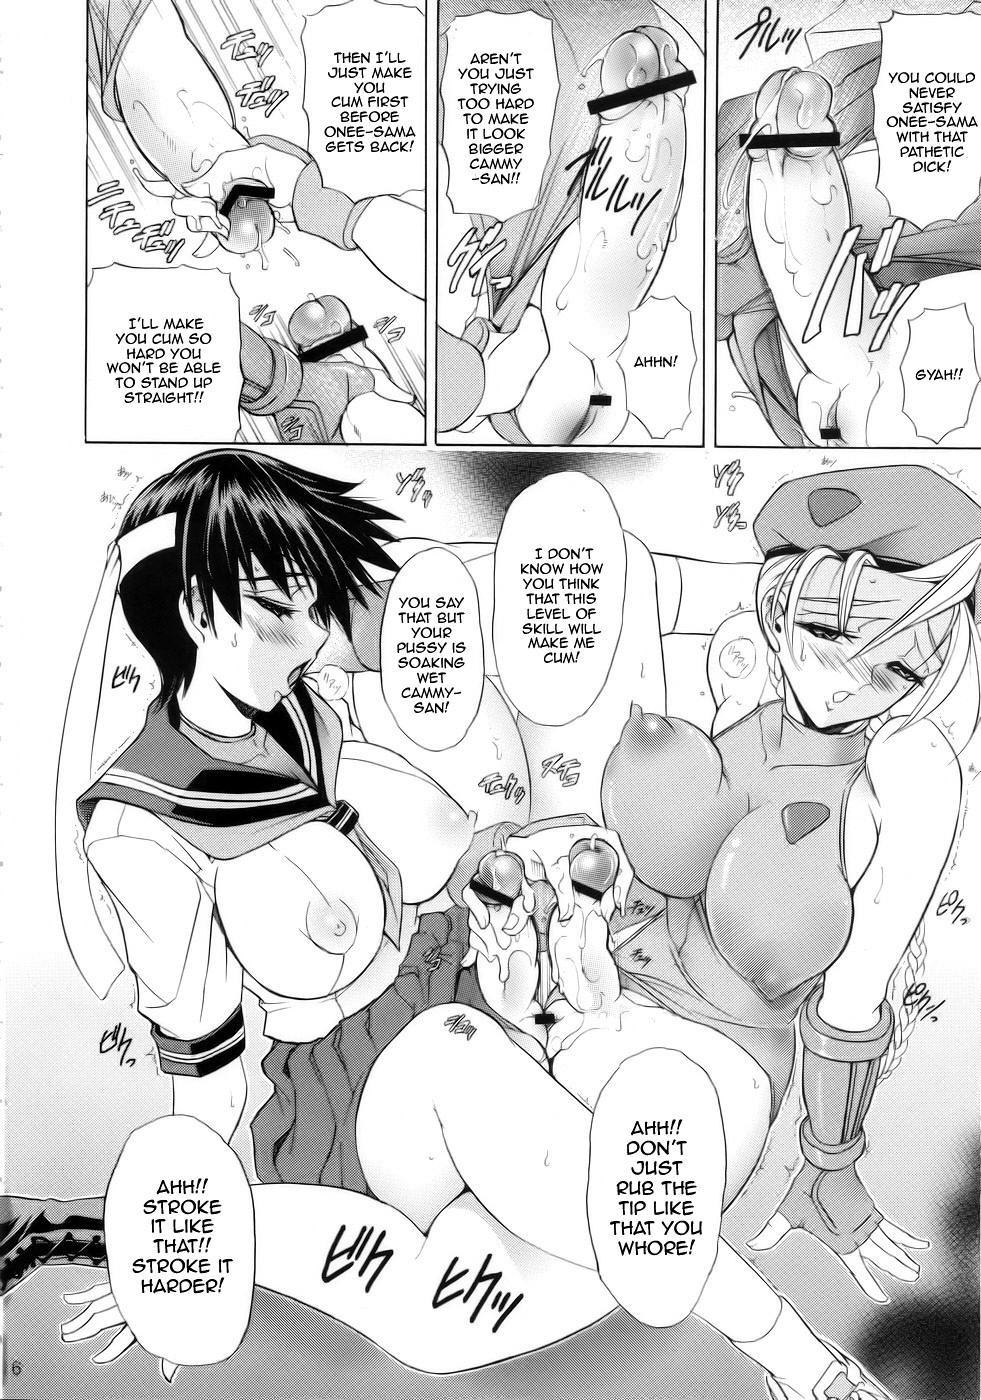 (C75) [Kawaraya Honpo (Kawaraya A-ta)] Hana - Maki no Juunana - Housenka (Street Fighter) [English] [Yuribou] 4